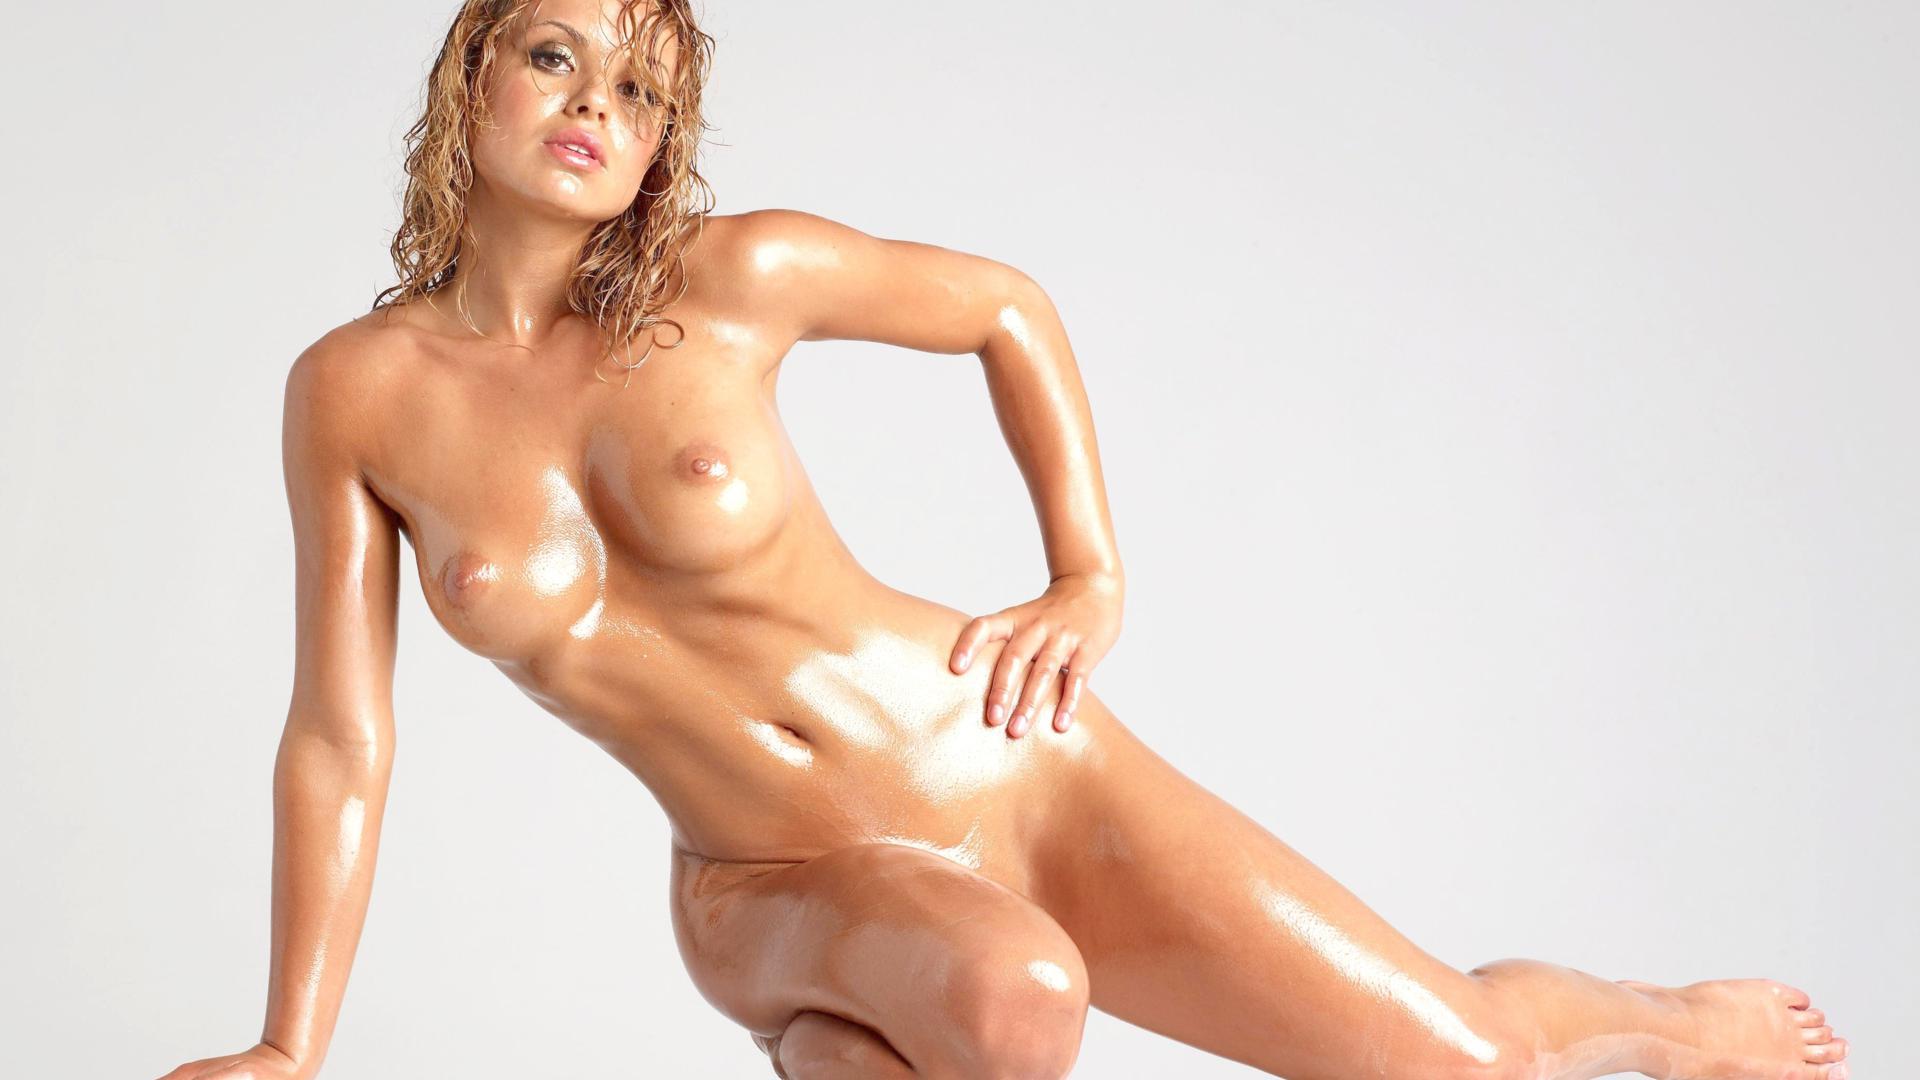 emma watson naked in harry potter